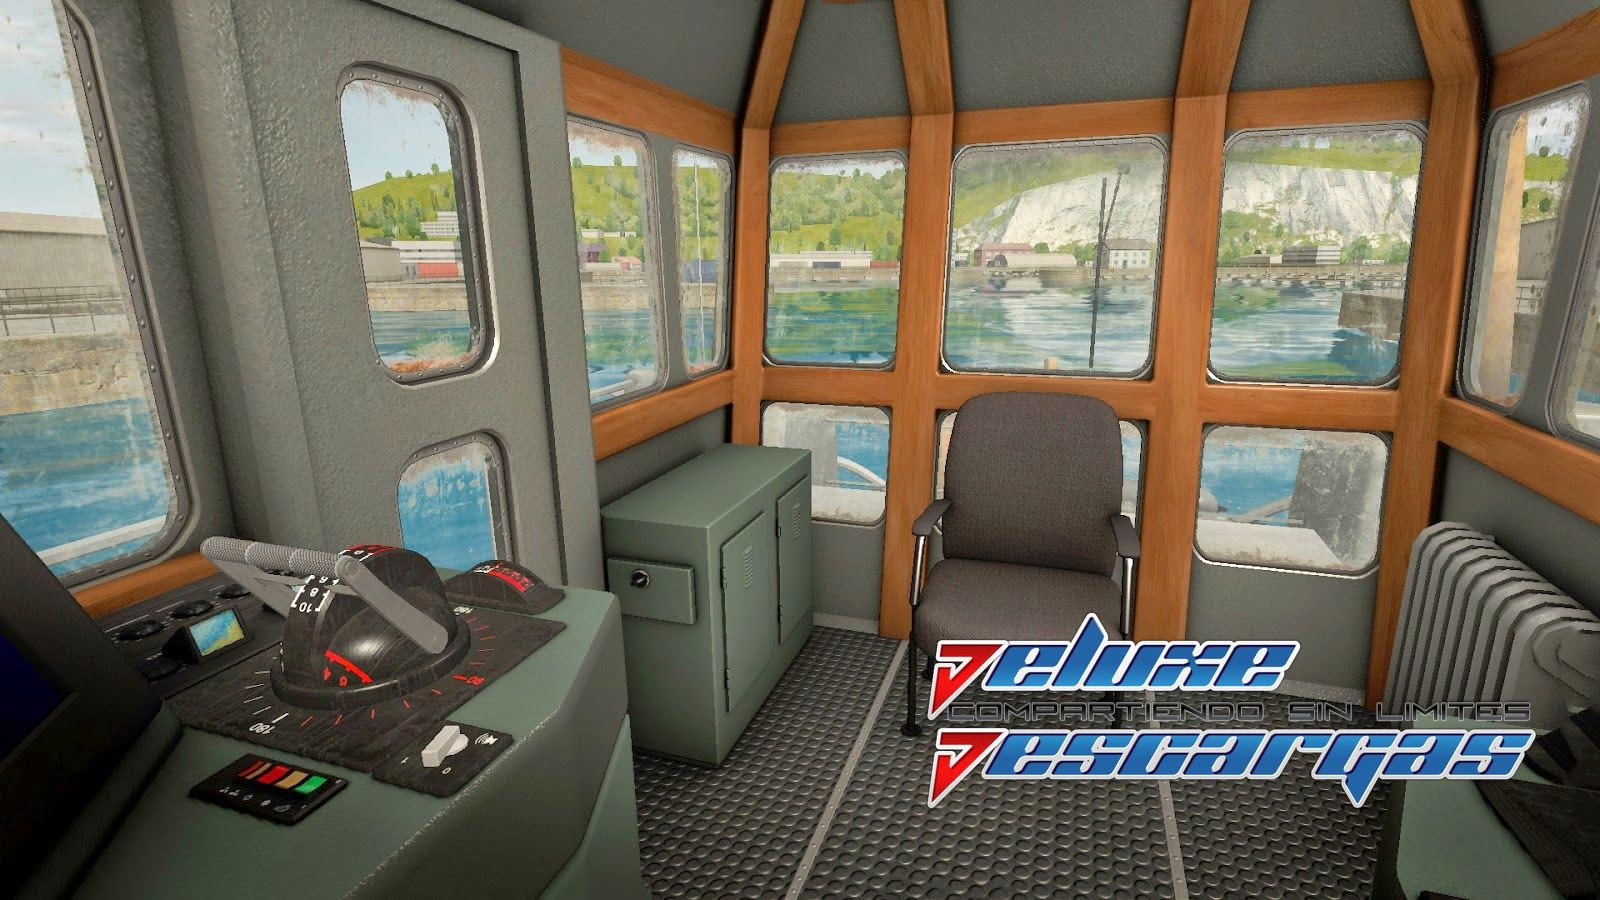 European_Ship_Simulator-www.deluxedescargas.com%2B(3).jpg